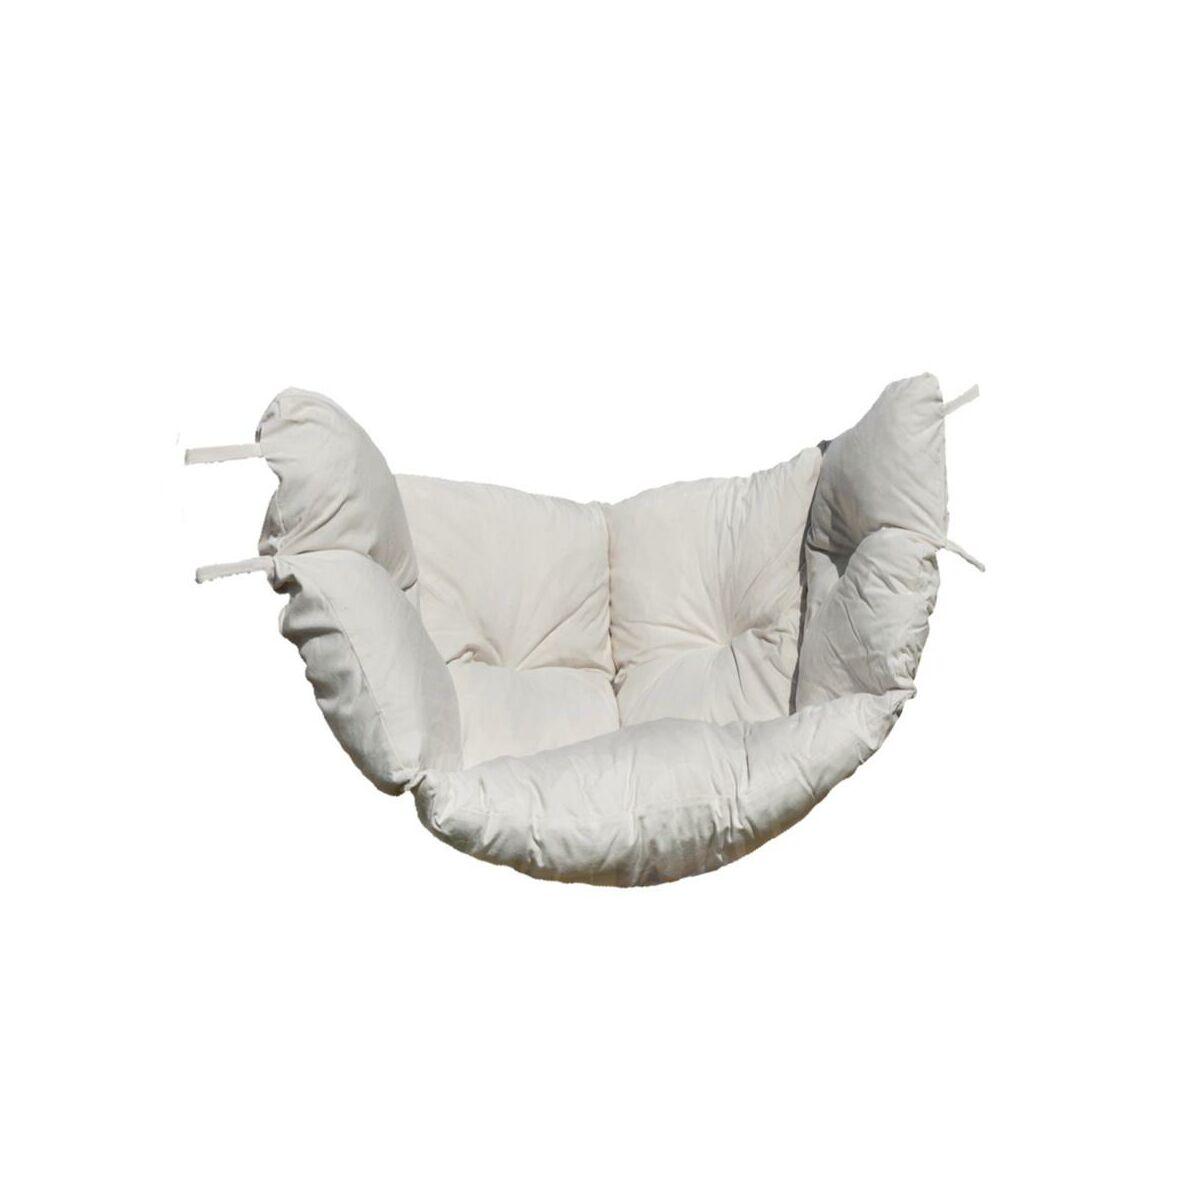 Poduszki Na Meble Ogrodowe Leroy Merlin :  Poduszki na meble ogrodowe  w atrakcyjnej cenie w sklepach Leroy